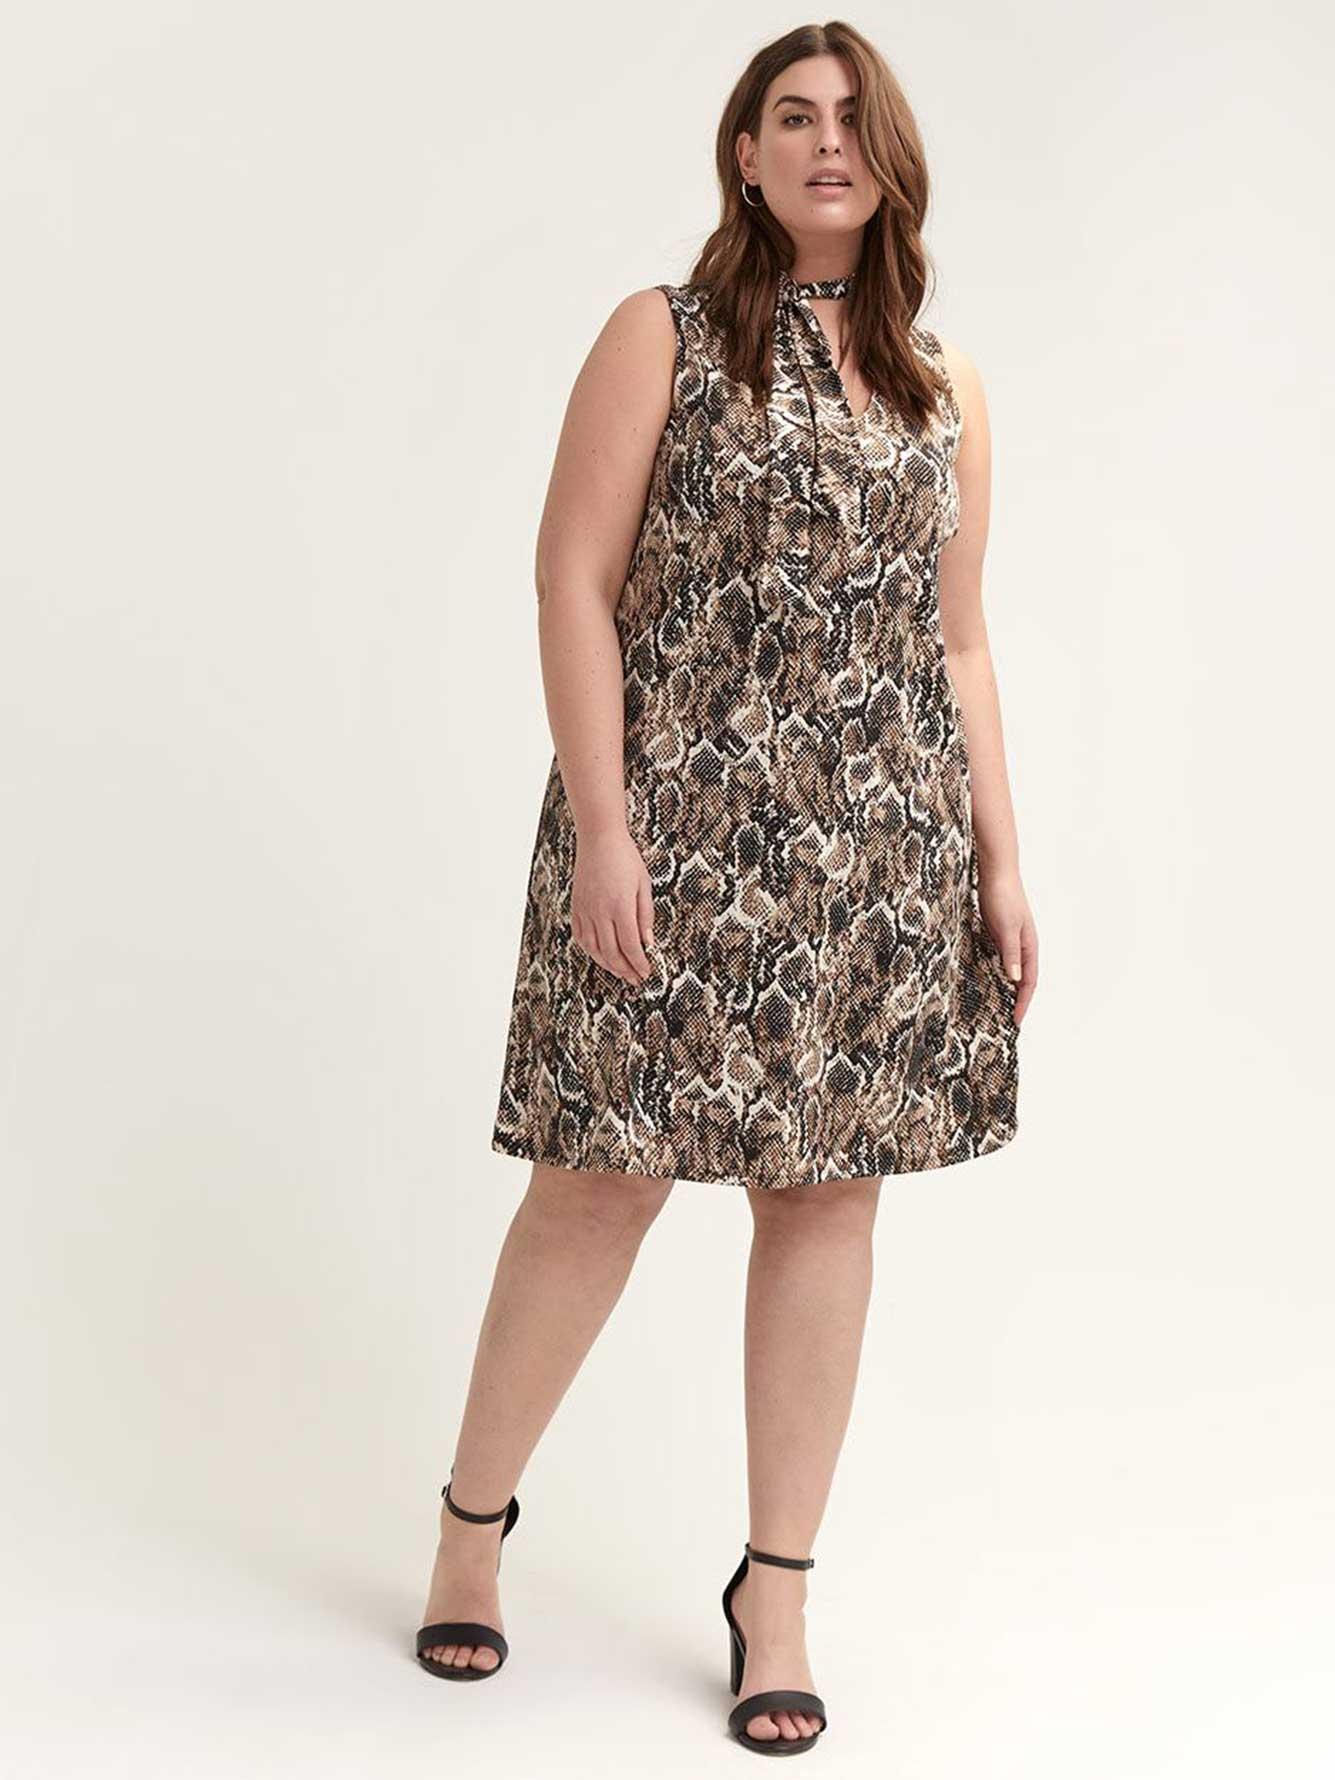 Snake Print Dress with Bow at Neckline - L&L   Penningtons